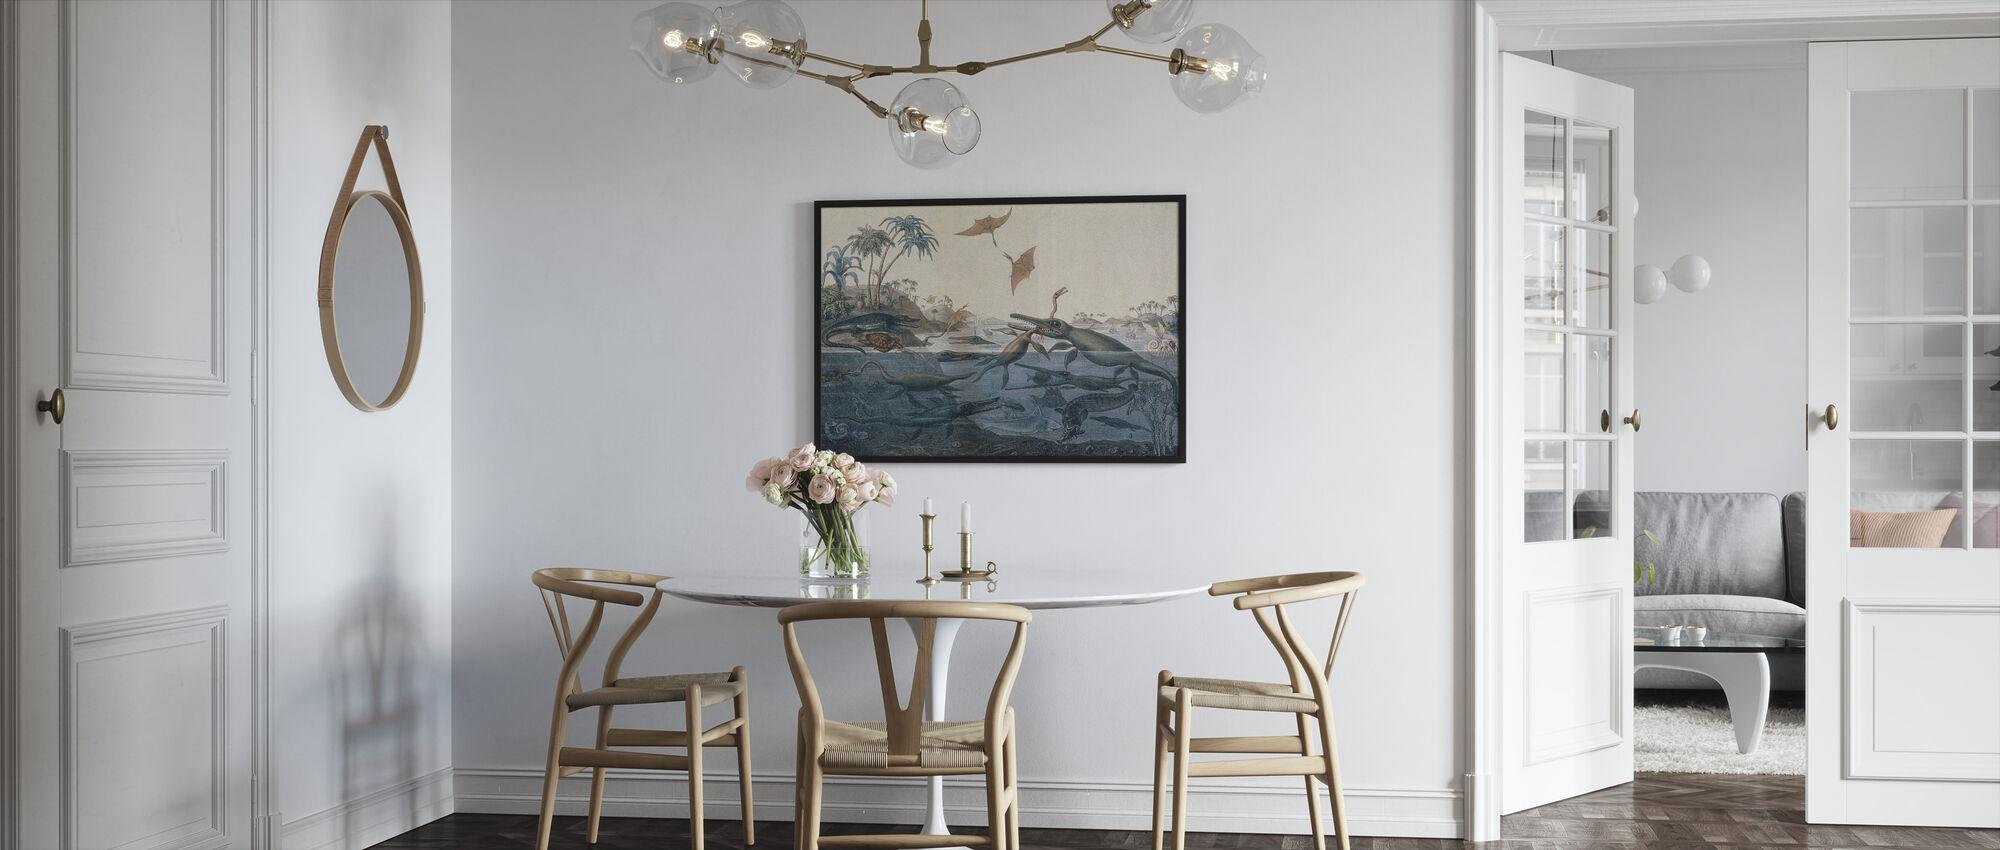 Henry De la Beche - Duria Antiquior - Framed print - Kitchen